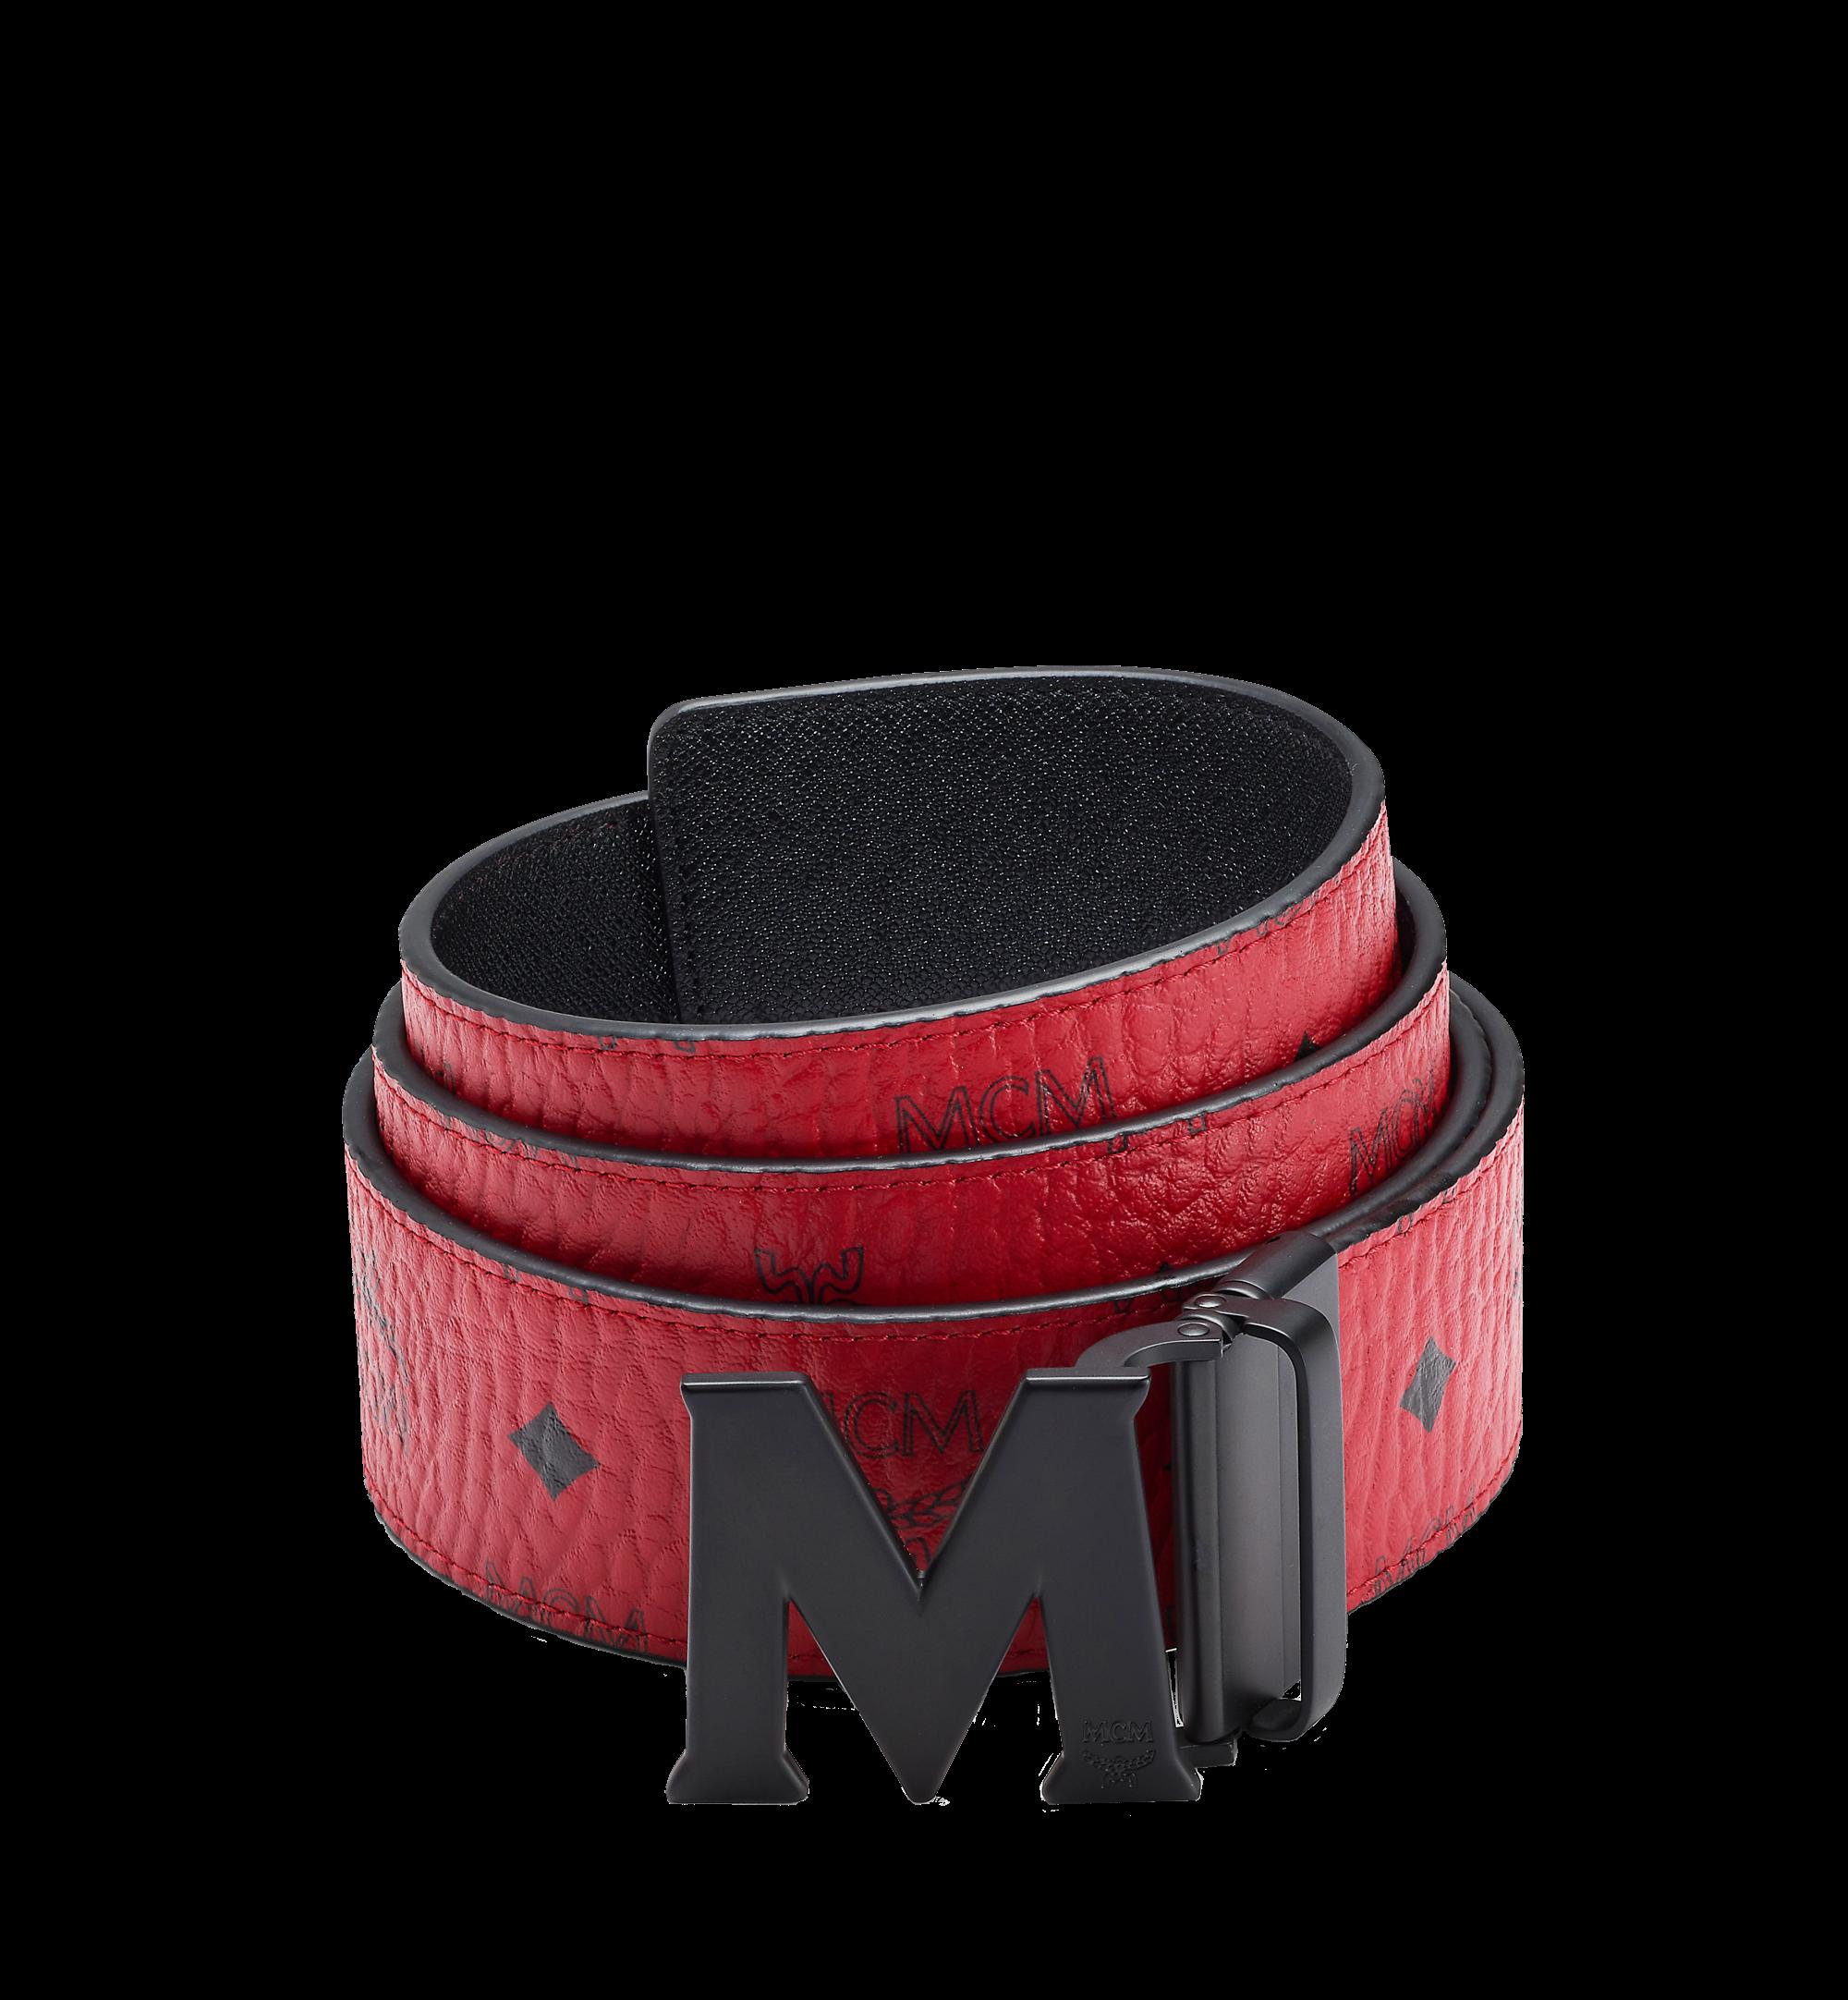 MCM Claus M Reversible Belt Visetos Matte Black-tone 1.75W 51In/130Cm Ruby Red